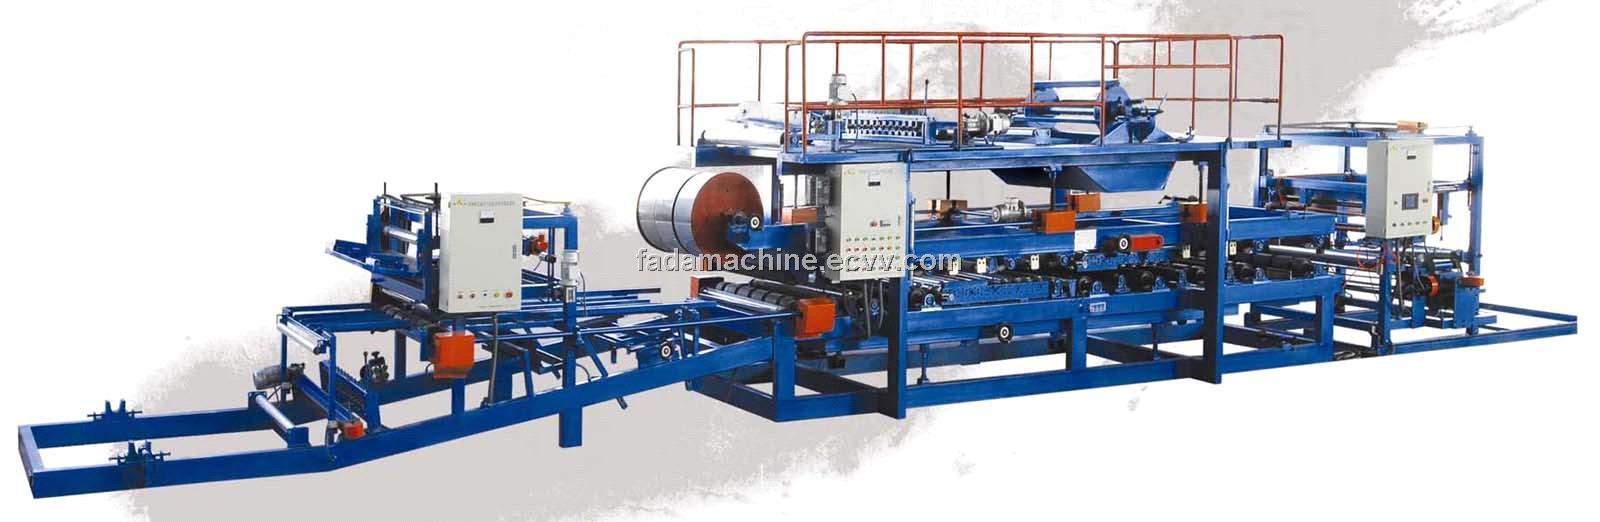 Fireproof Rock Wool Sandwich Panel Making Machine Line